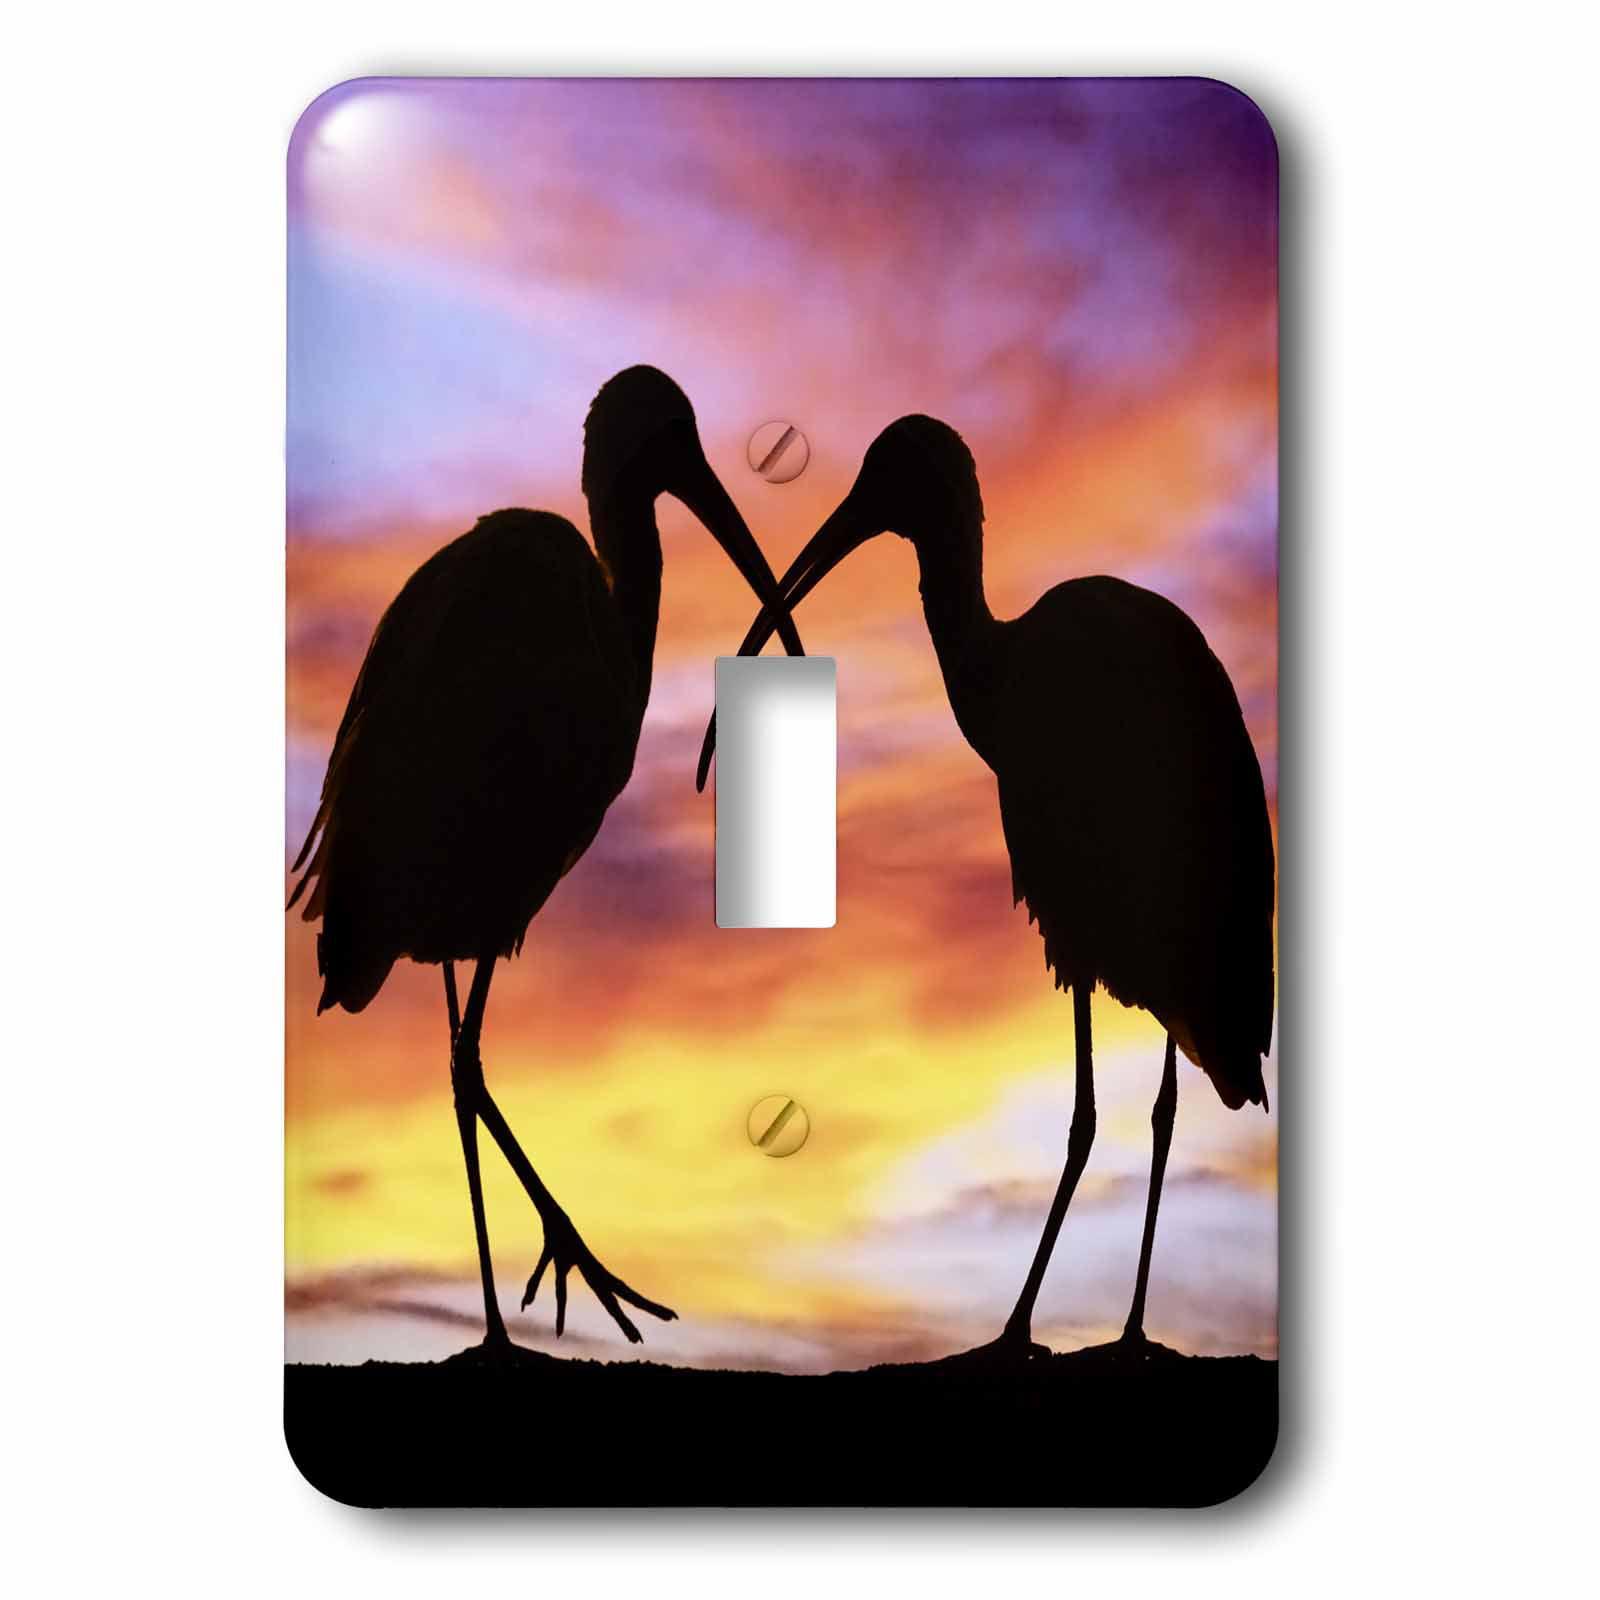 3dRose Florida, Mt. Dora, ibis bird silhouettes - US10 DSN0012 - Deborah Sandidge, Double Toggle Switch